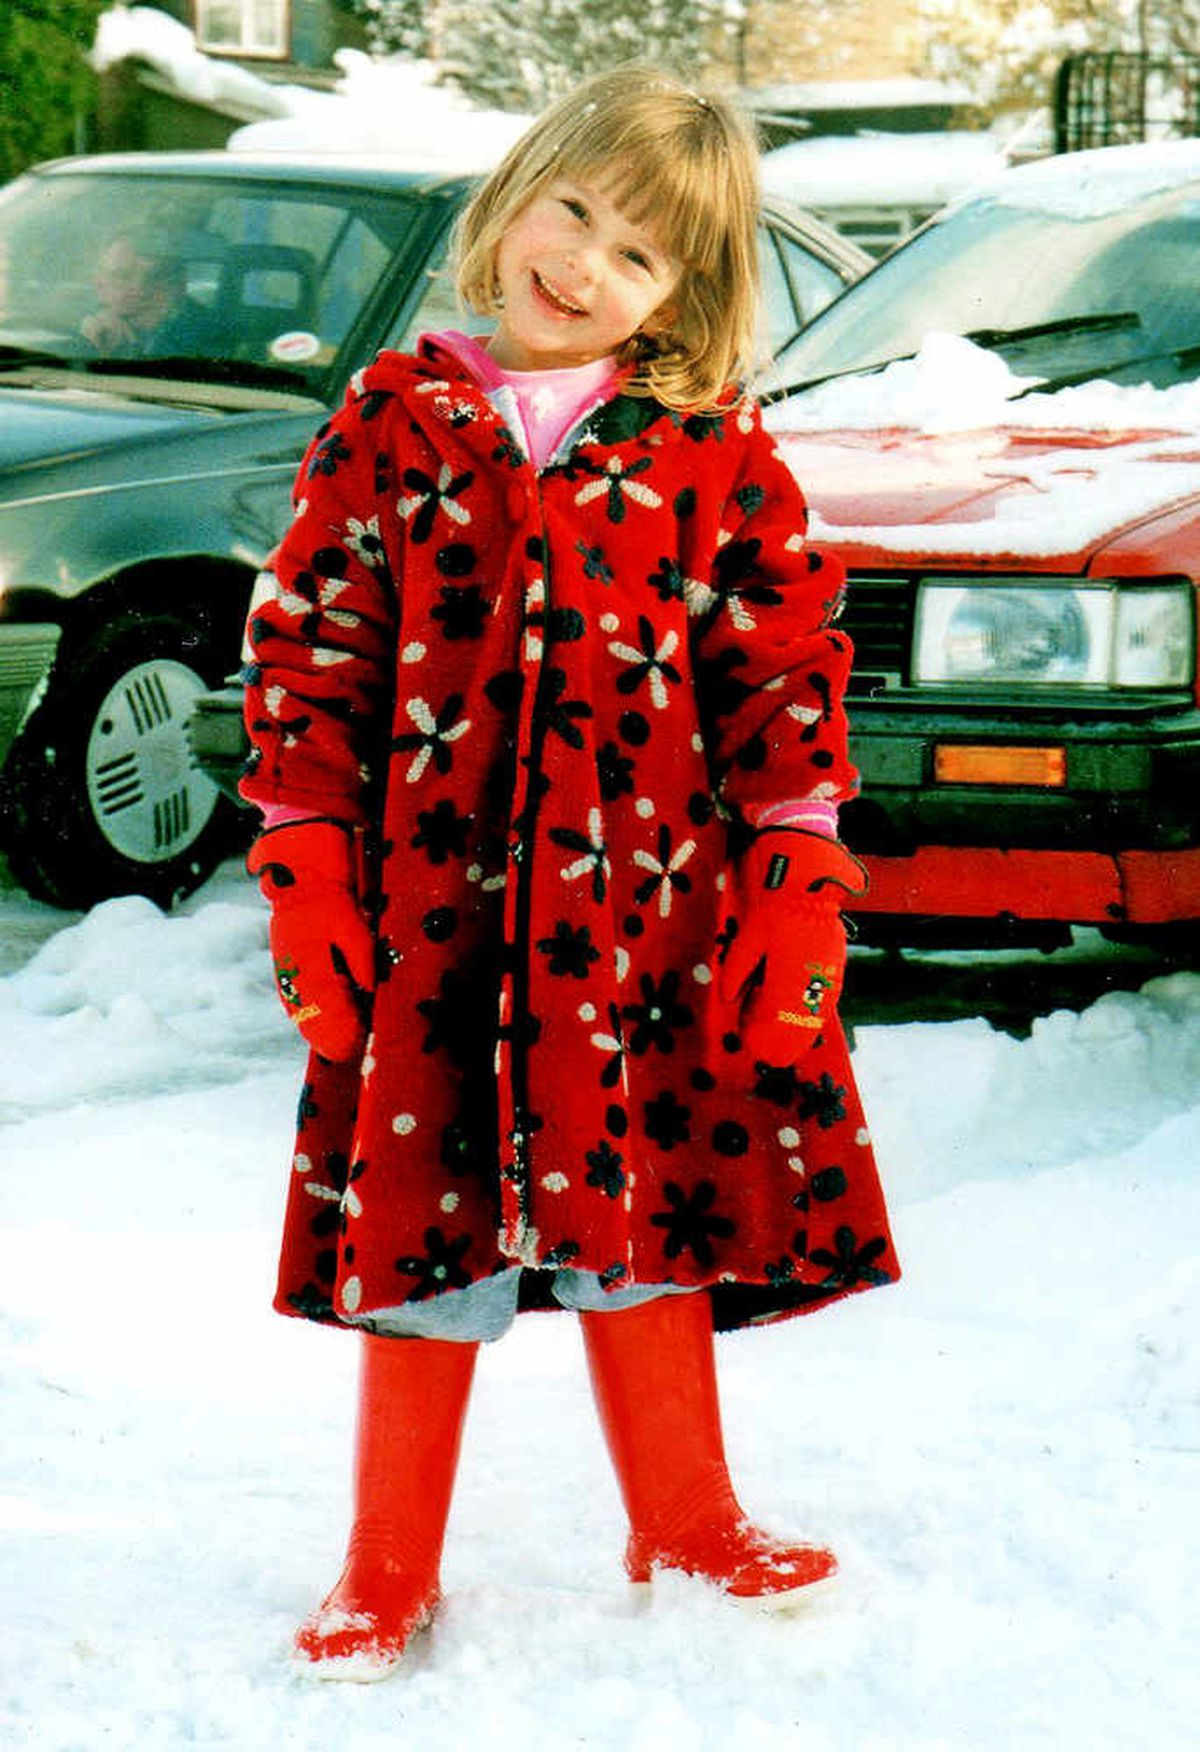 Former Cradley schoolgirl Charlotte Dunn who was killed